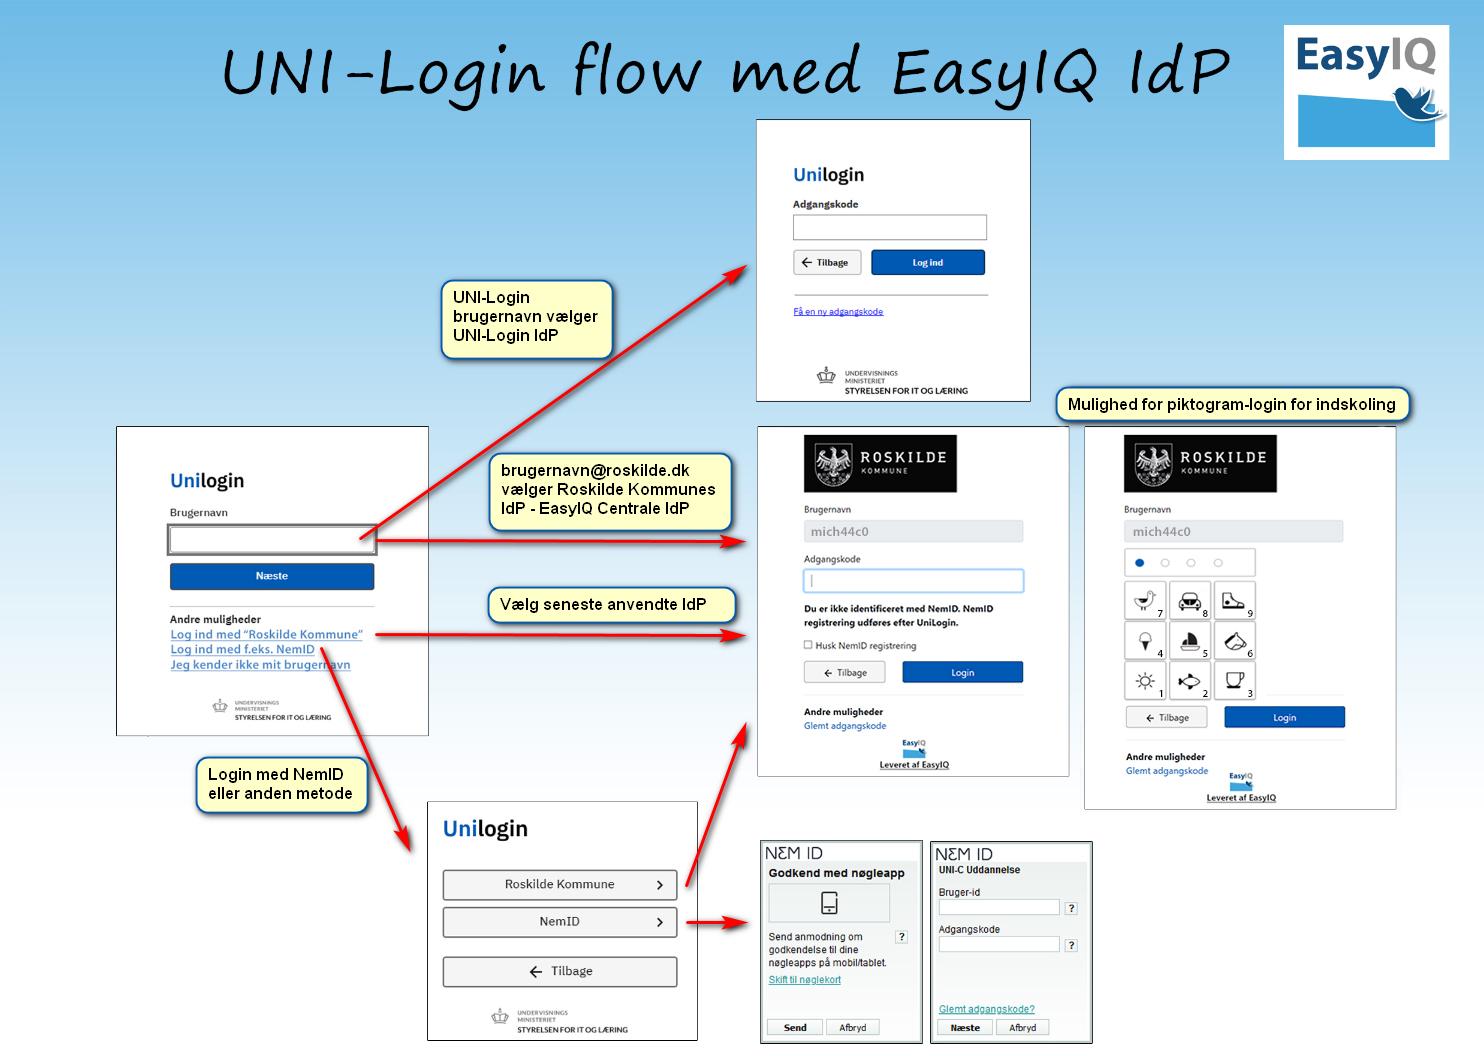 UNI-Loginflow med EasyIQ IdP_1